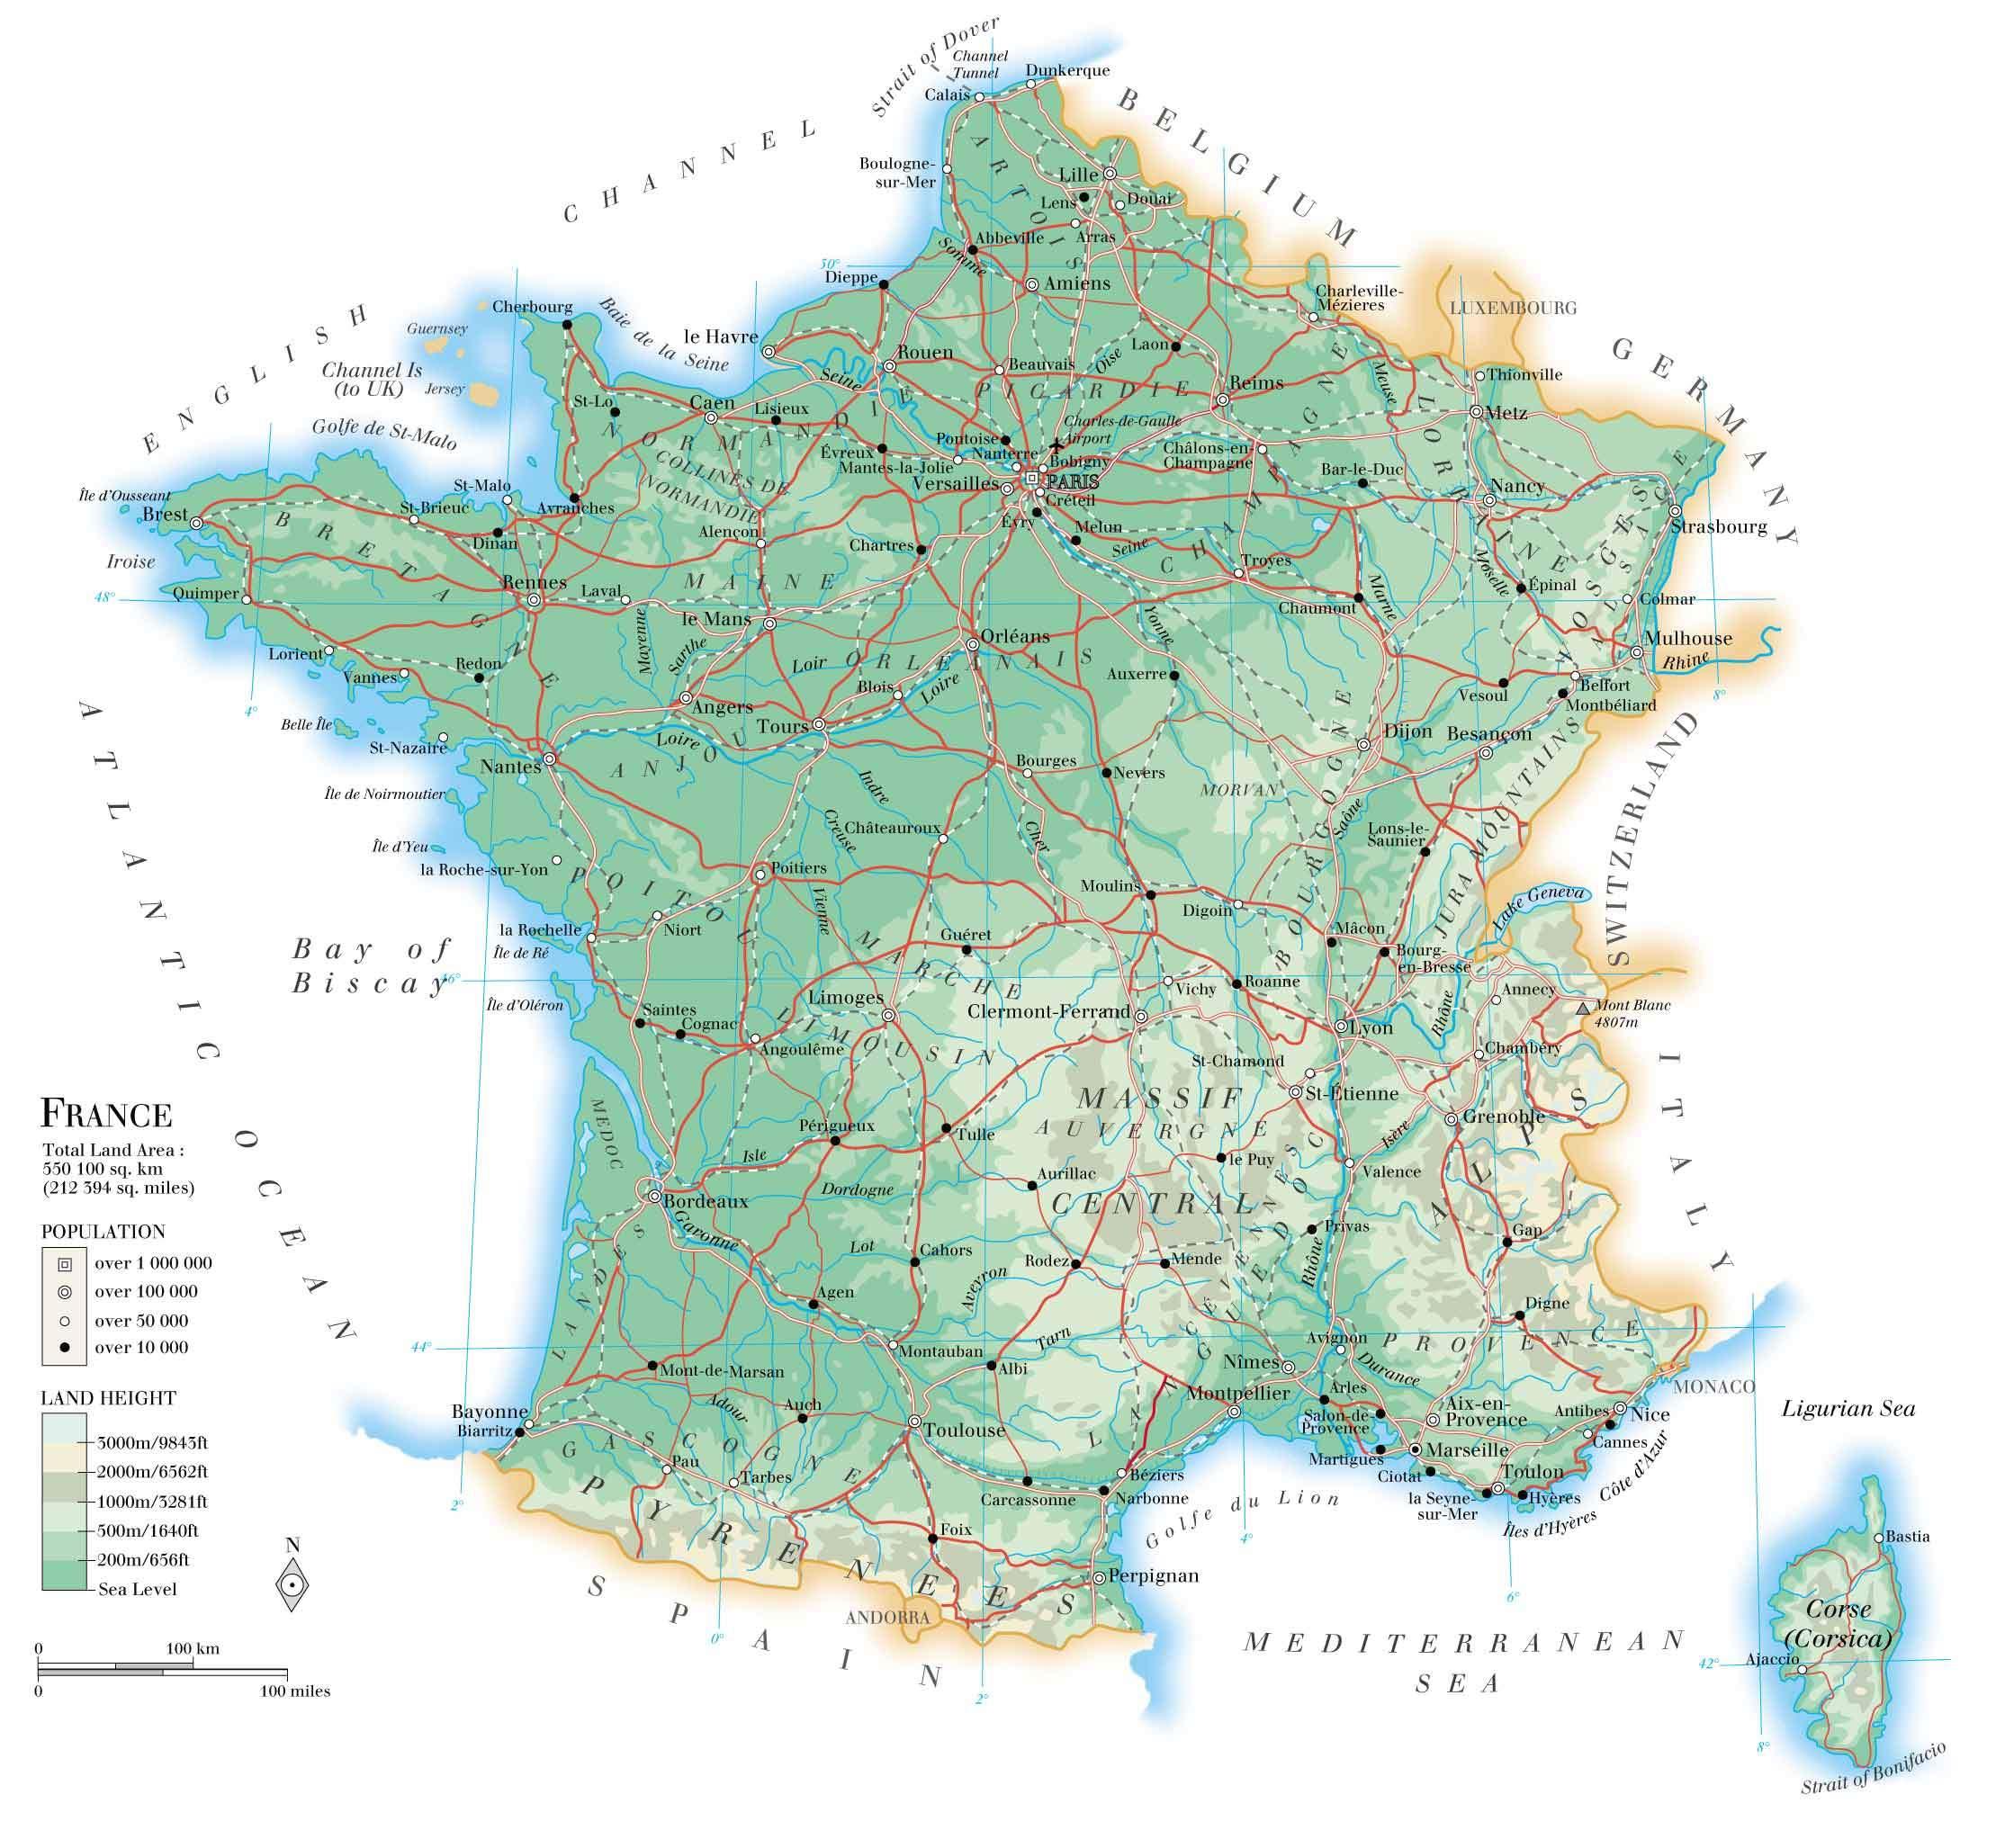 Grande Carte De France, Grande Carte De France avec Carte Des Fleuves De France